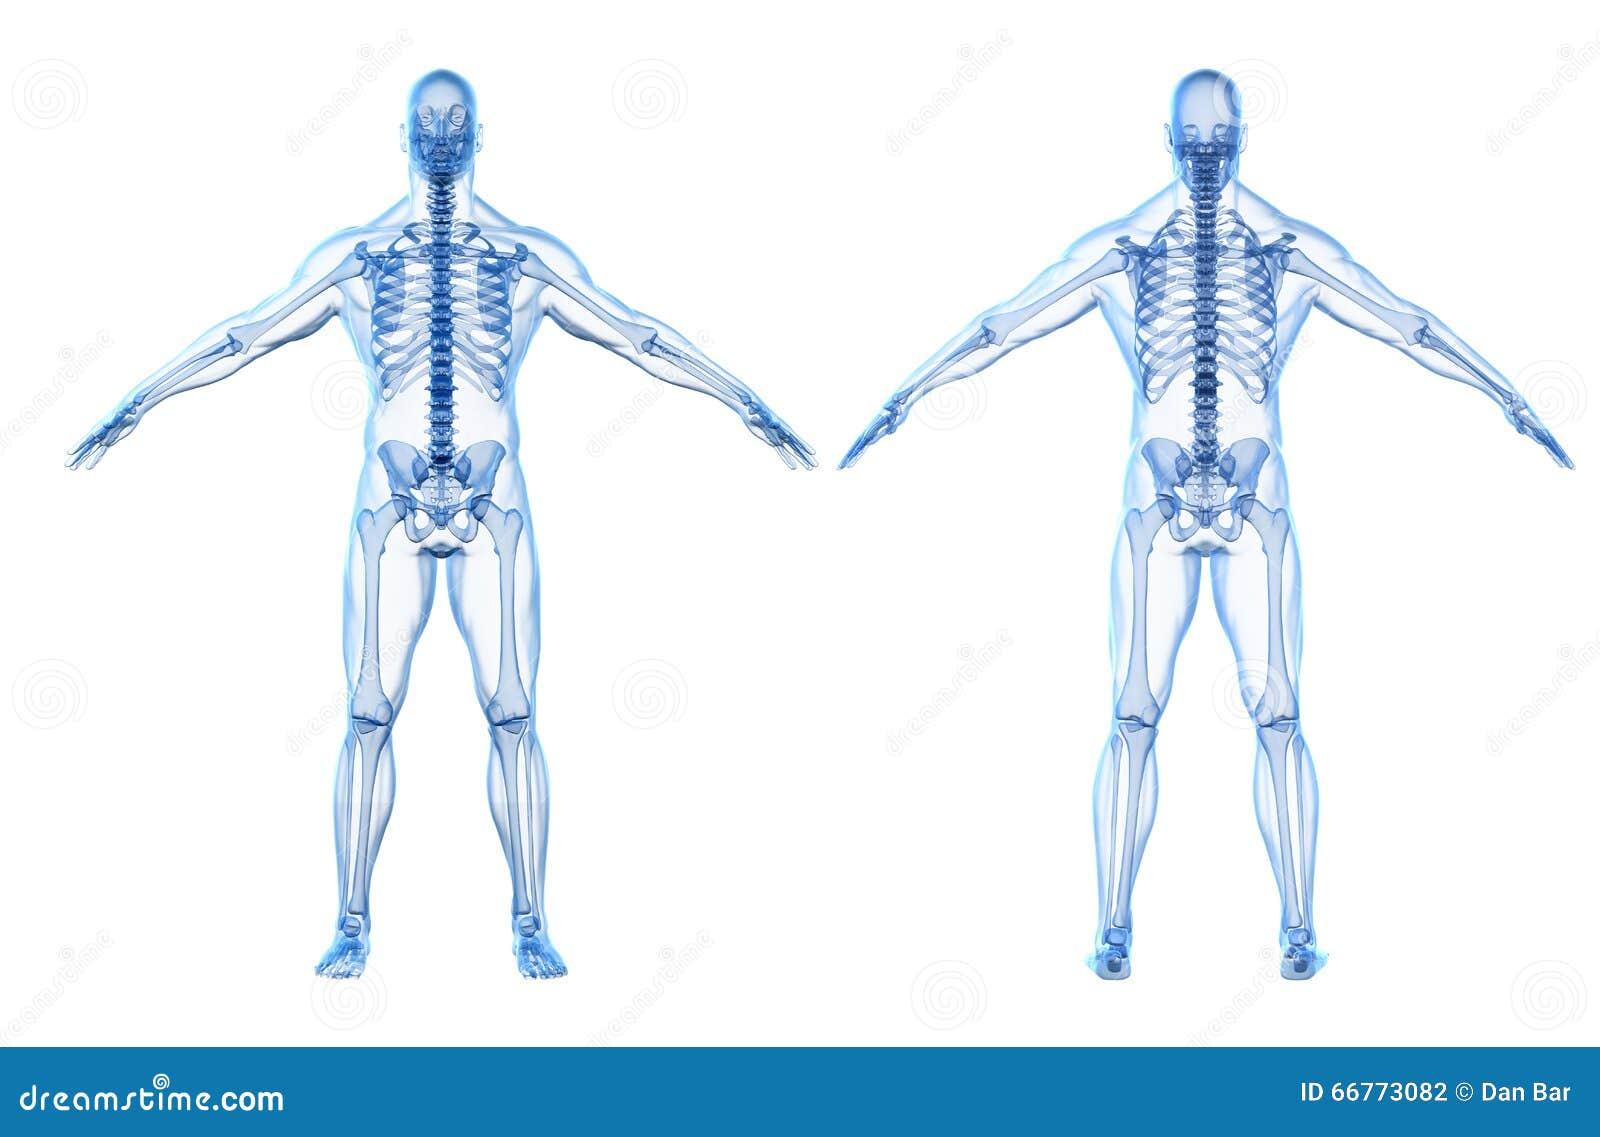 3d Render Of Human Body And Skeleton Stock Illustration